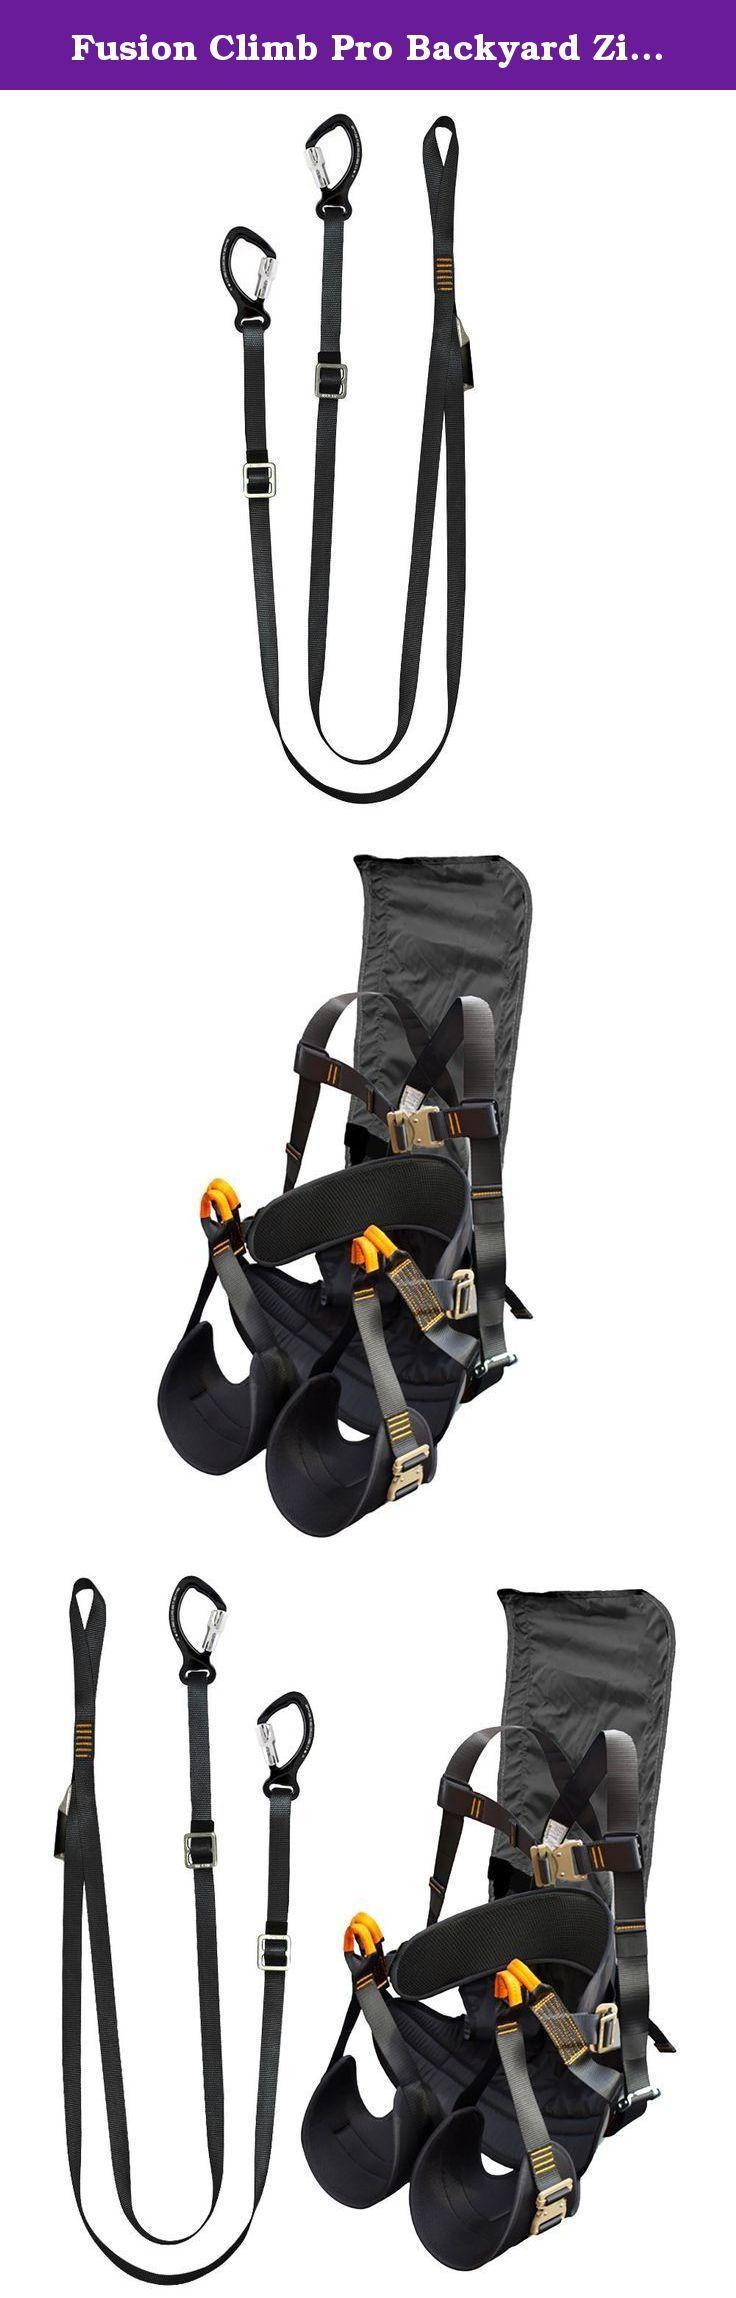 Fusion Climb Pro Backyard Zip FK-A-HL-15 Line Kit Harness ...